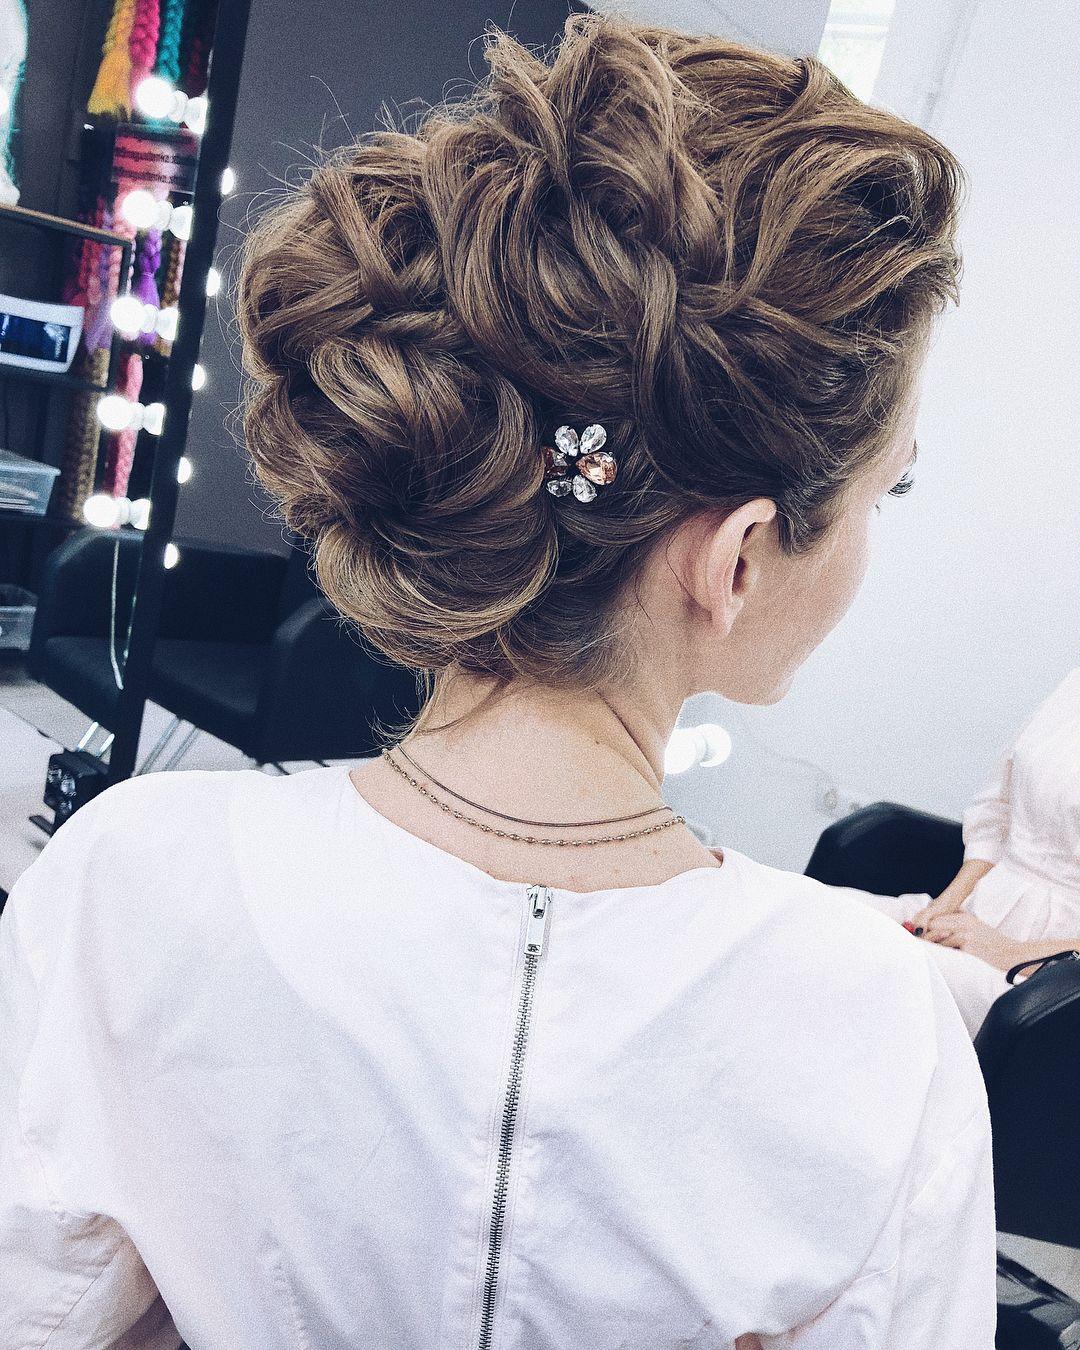 15 Pretty Prom Hairstyles 2021 Boho Retro Edgy Hair Styles Popular Haircuts Long Hair Styles Braids For Long Hair Hair Styles